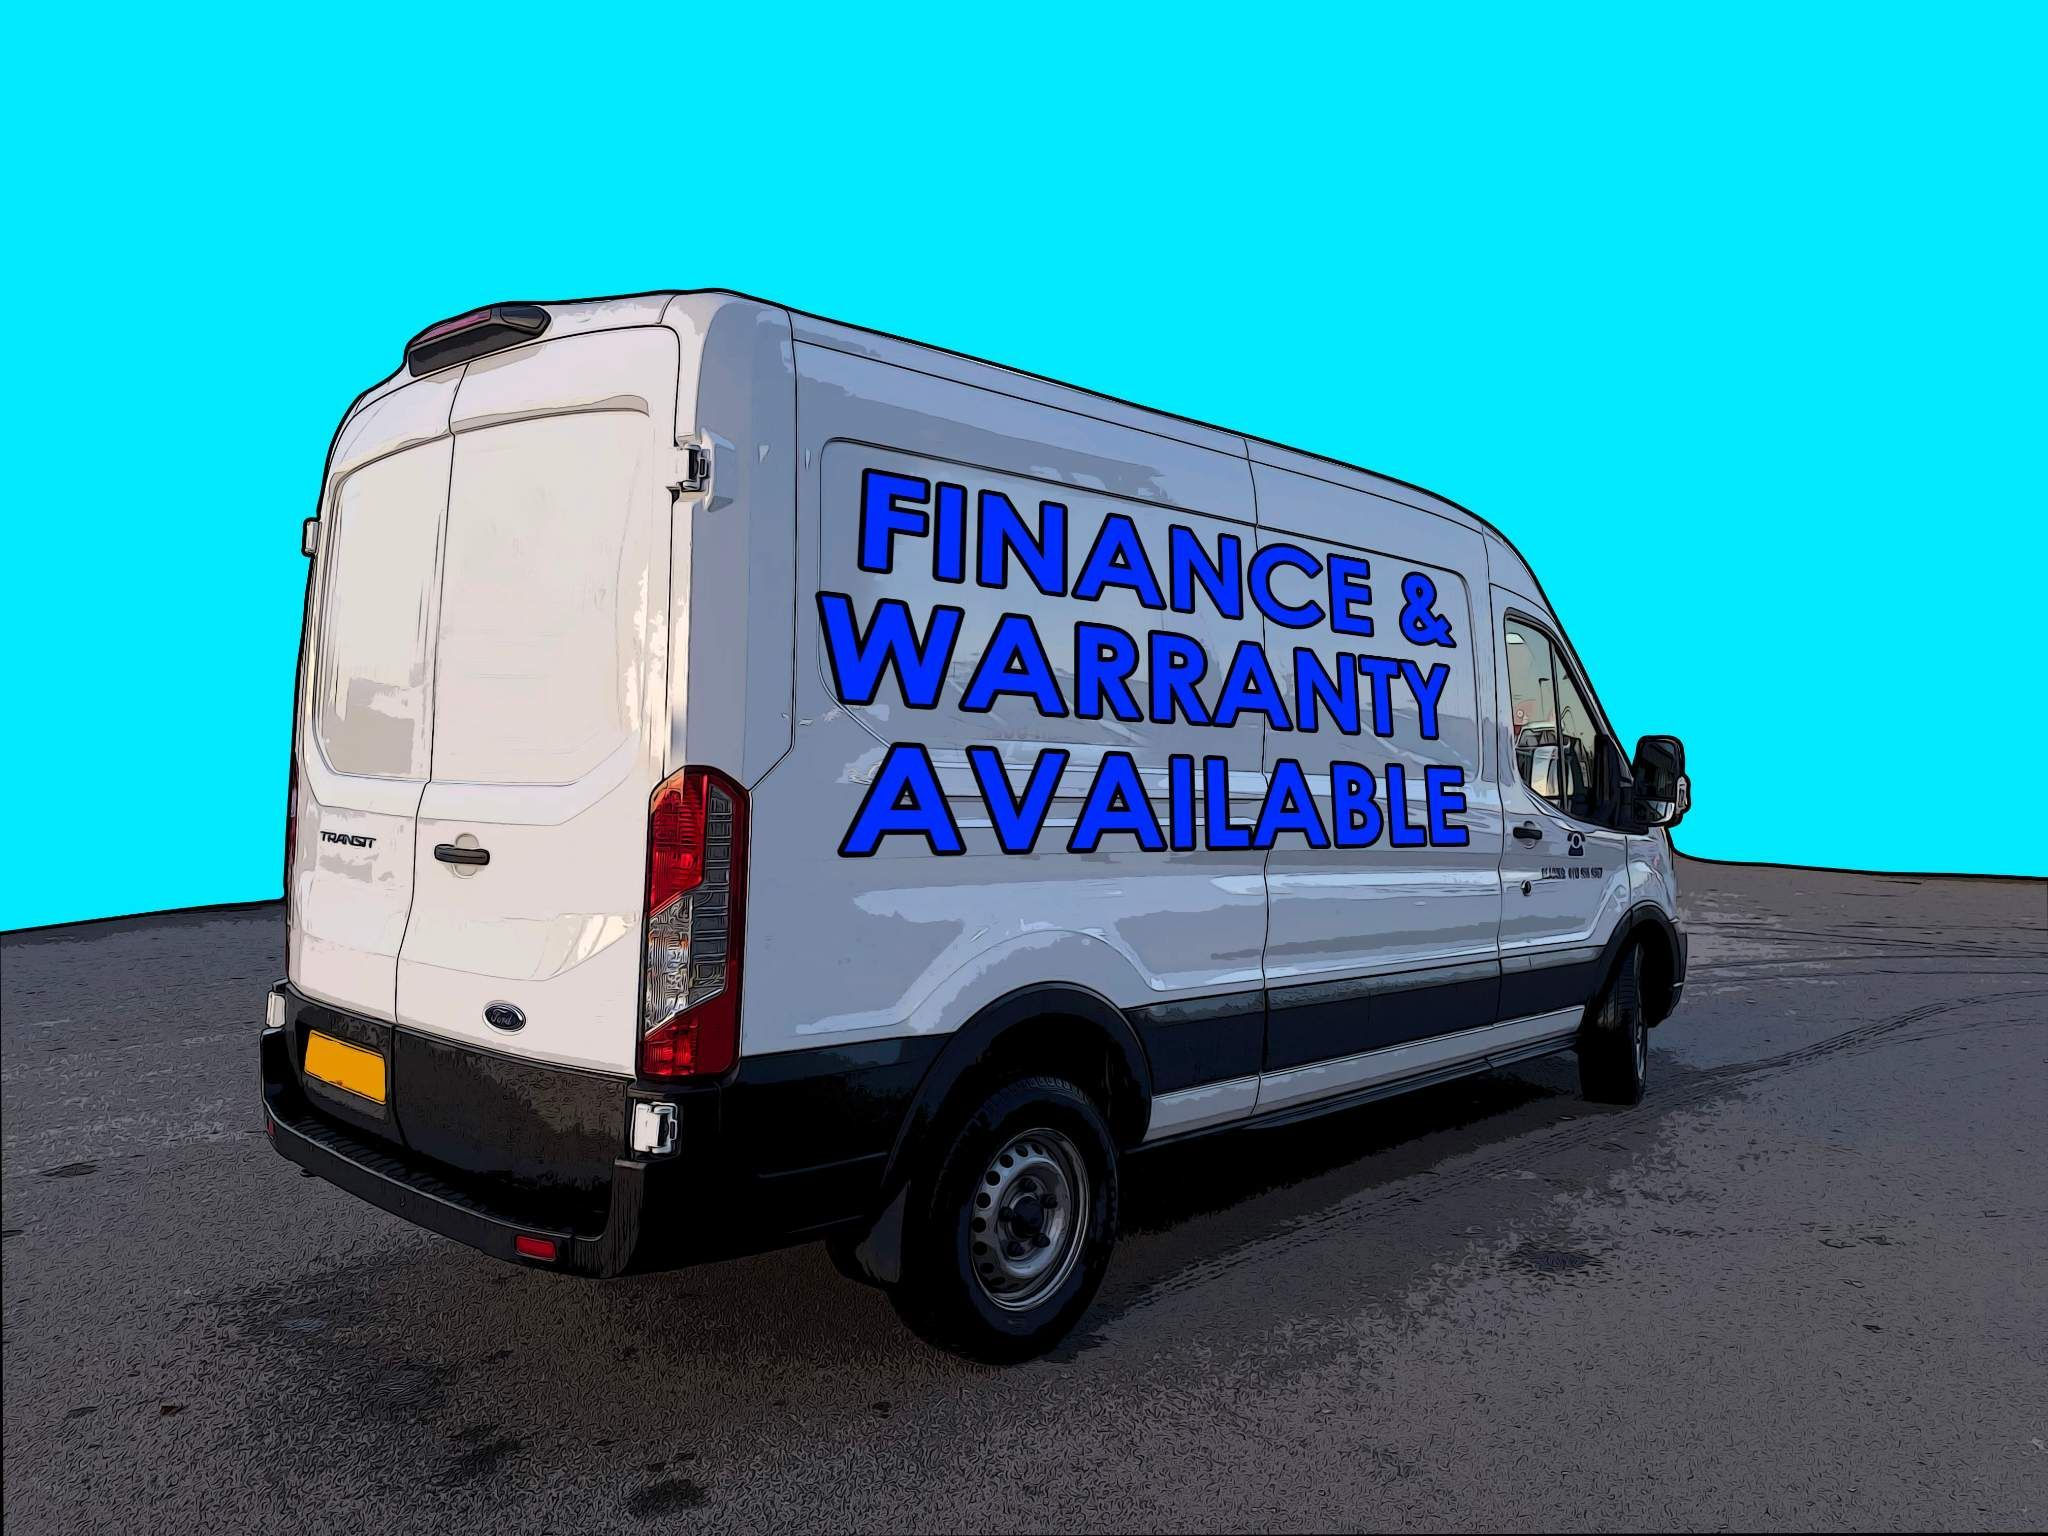 RenaultTrafic Business PlusBusiness Plus For Sale